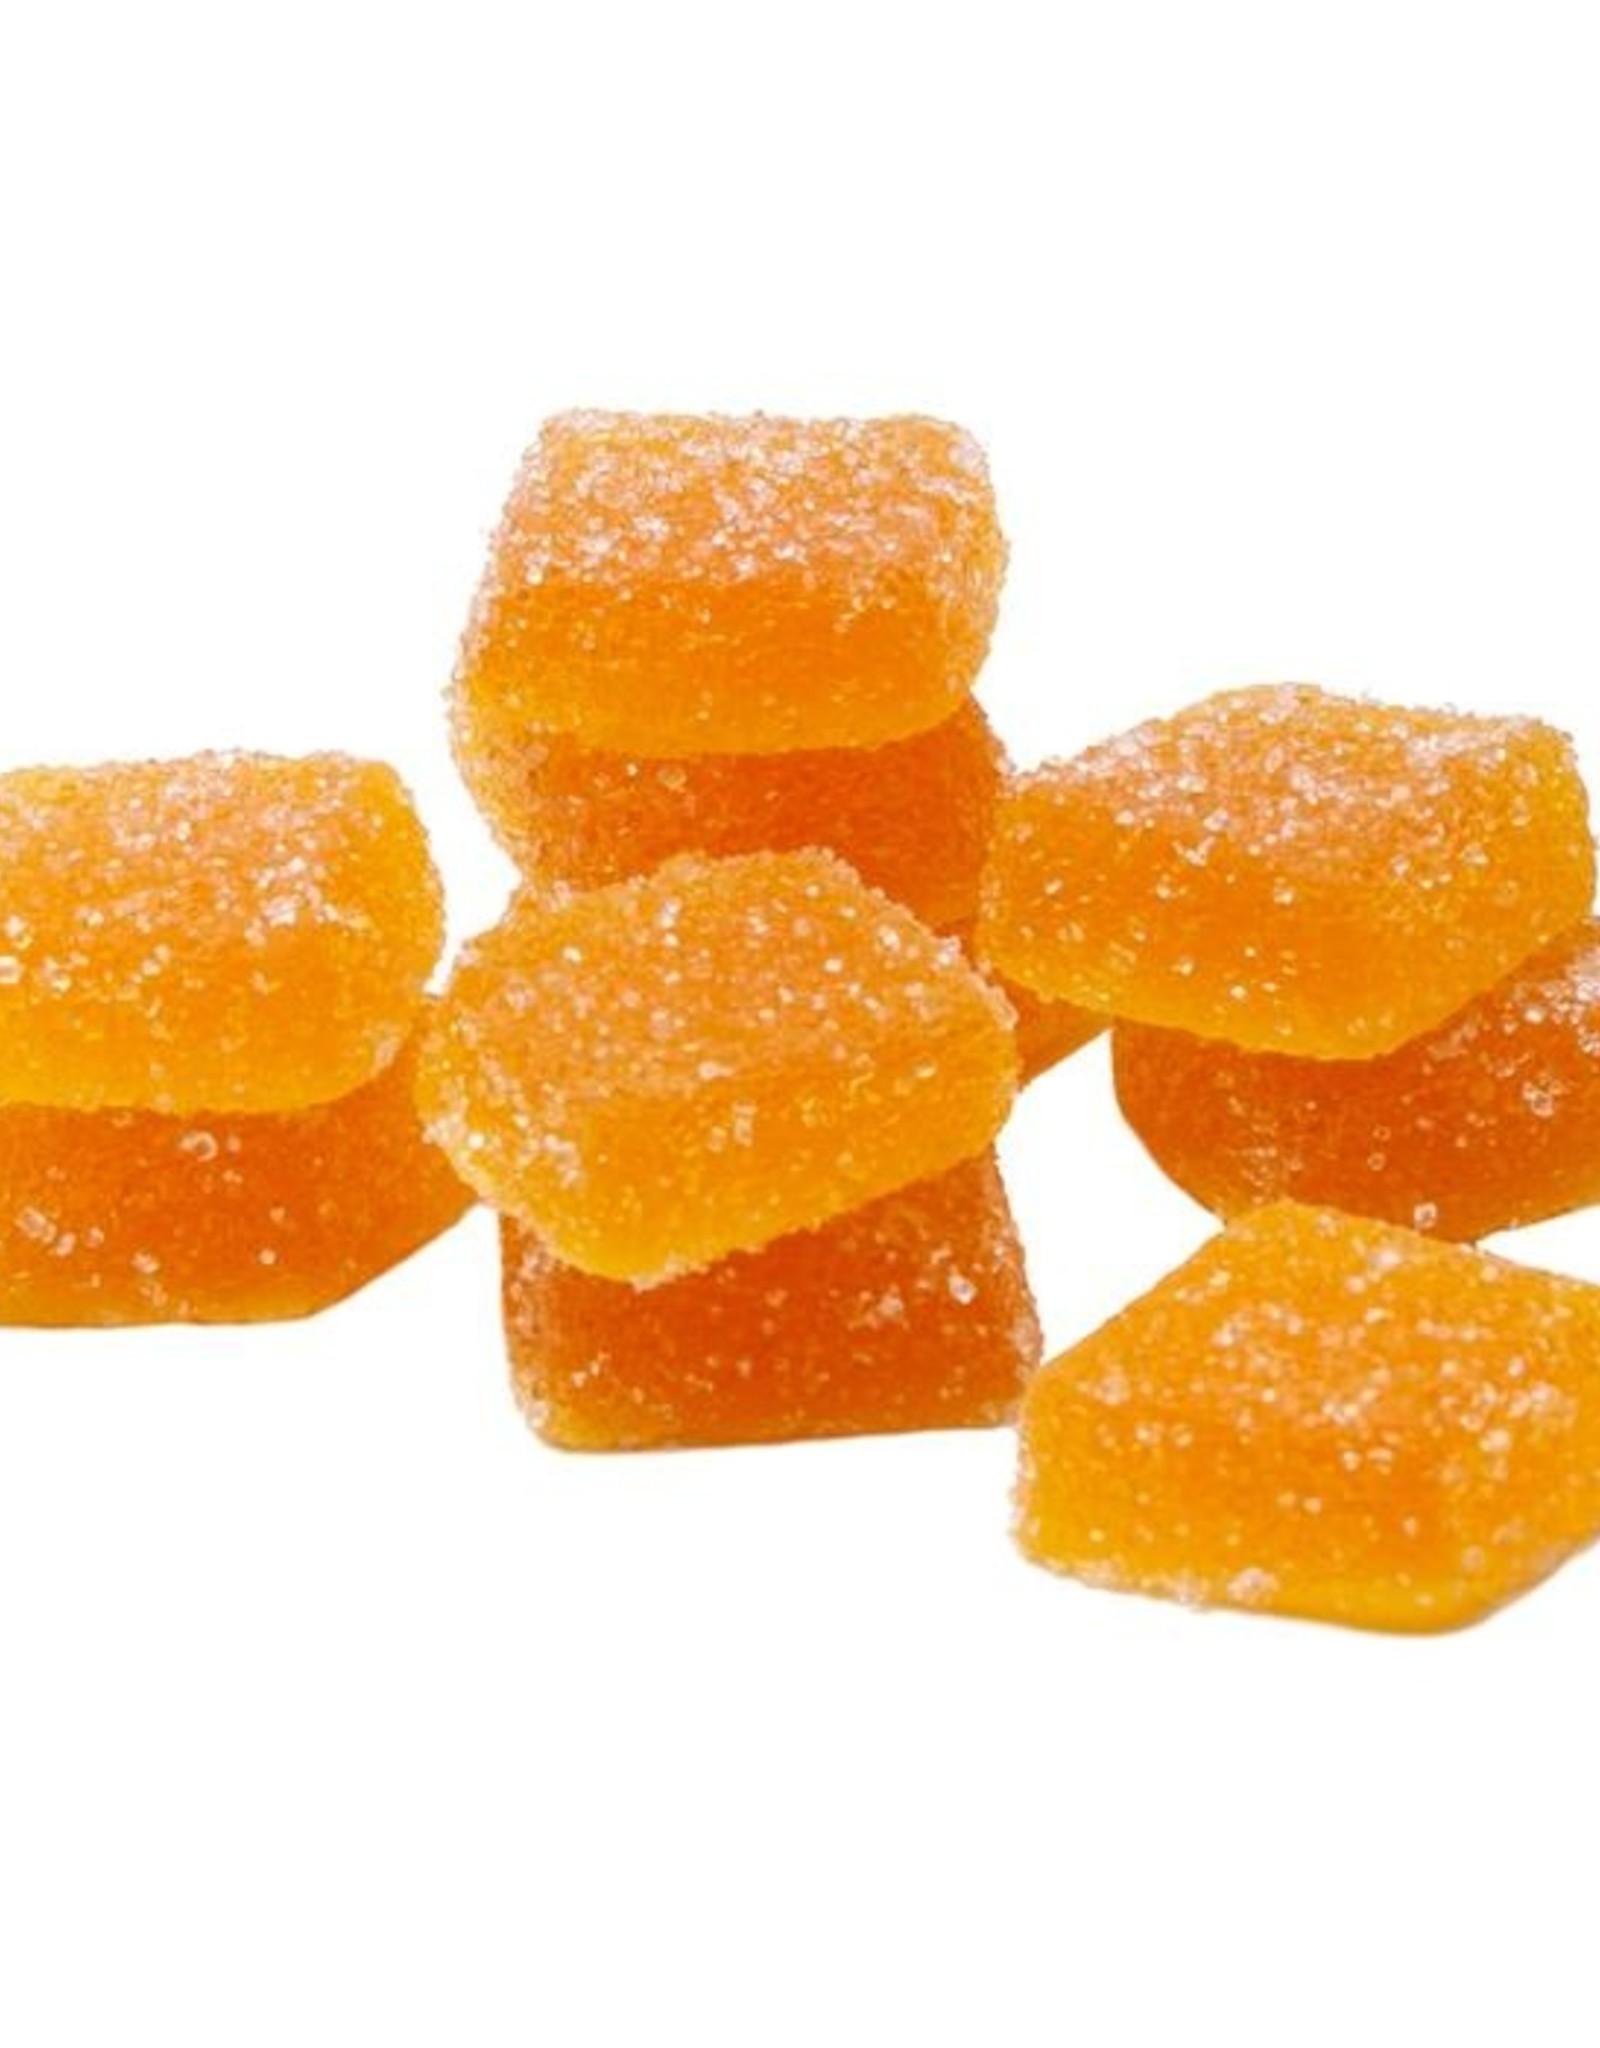 Pure Sunfarms Pure Sunfarms - Peach Nectar CBD Gummies